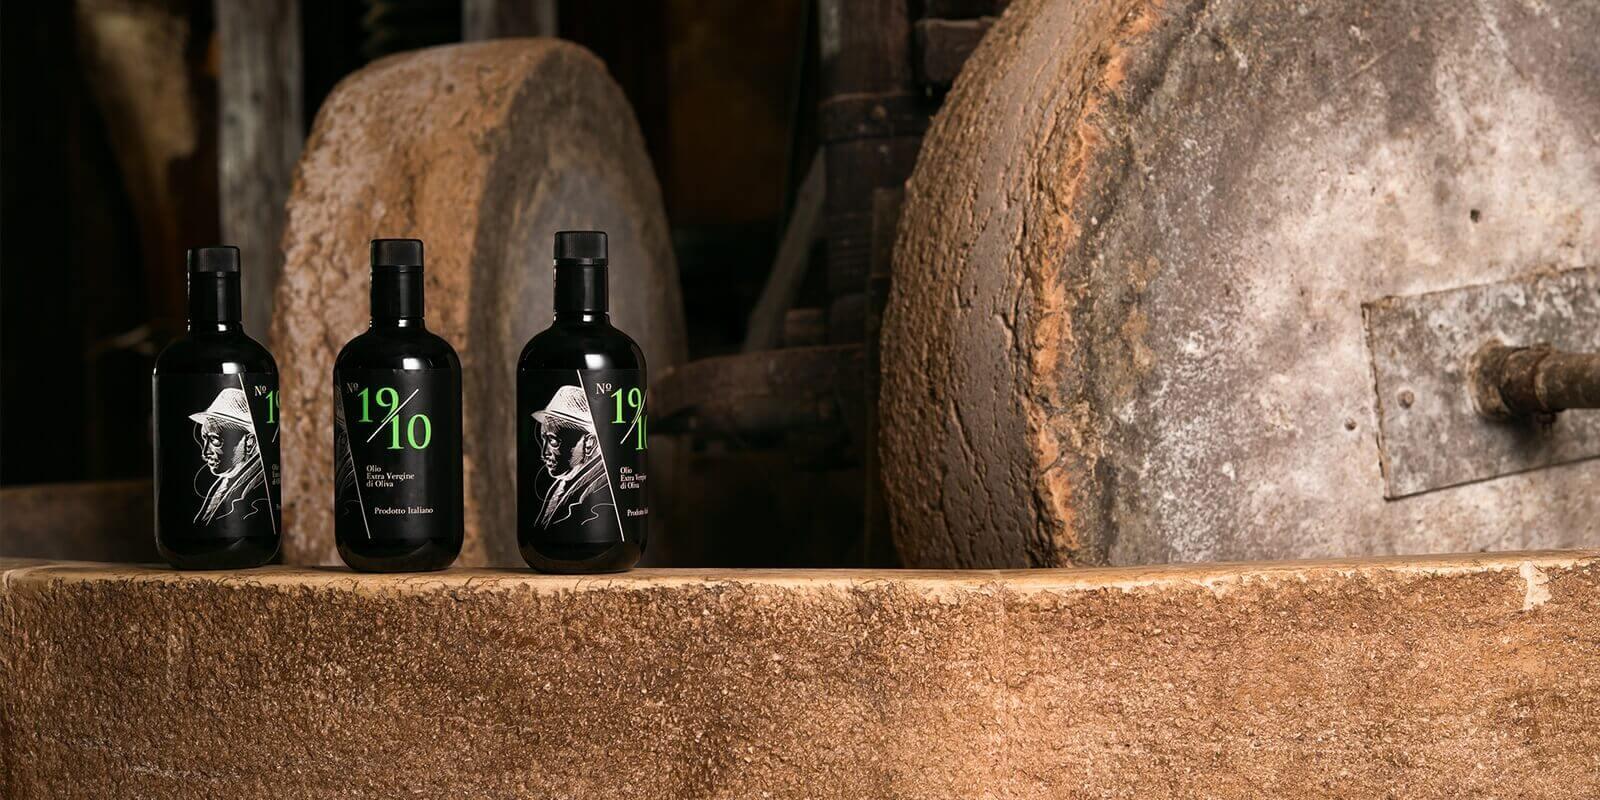 Sito web produttore olio extravergine d'oliva: Frantoio Pace Leone - Maingage, Web agency Bari